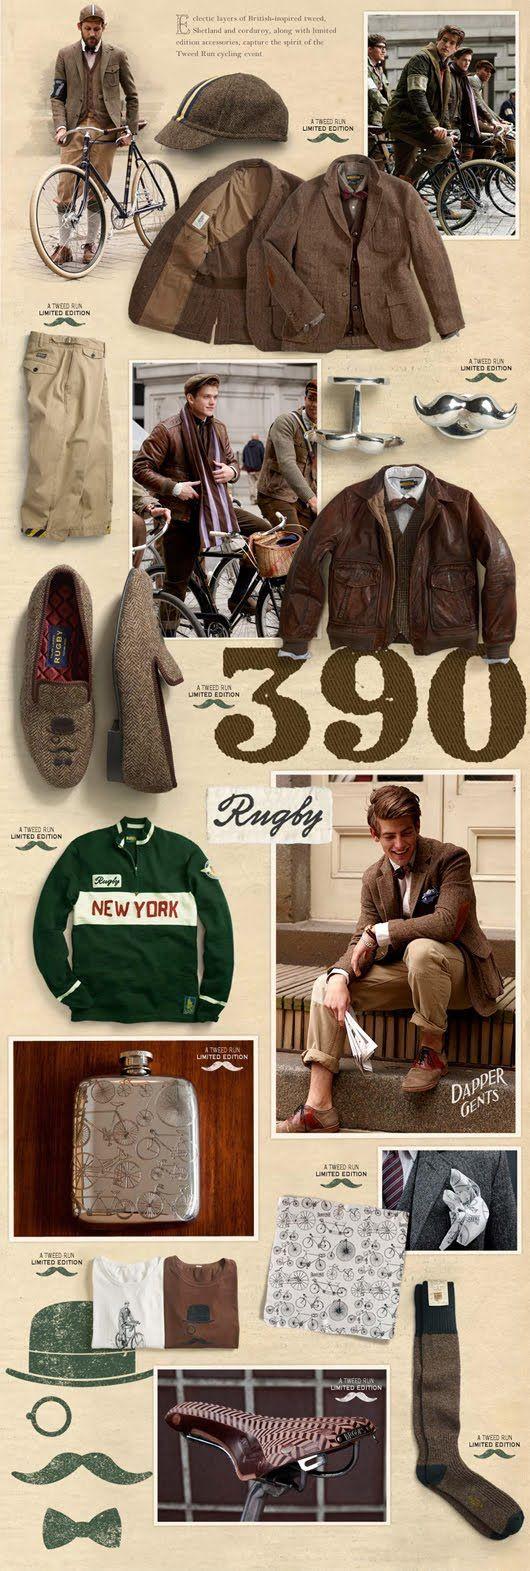 Great layout-Tweed+Run+Gents+Fashion+copy.jpg 530×1,571 pixels